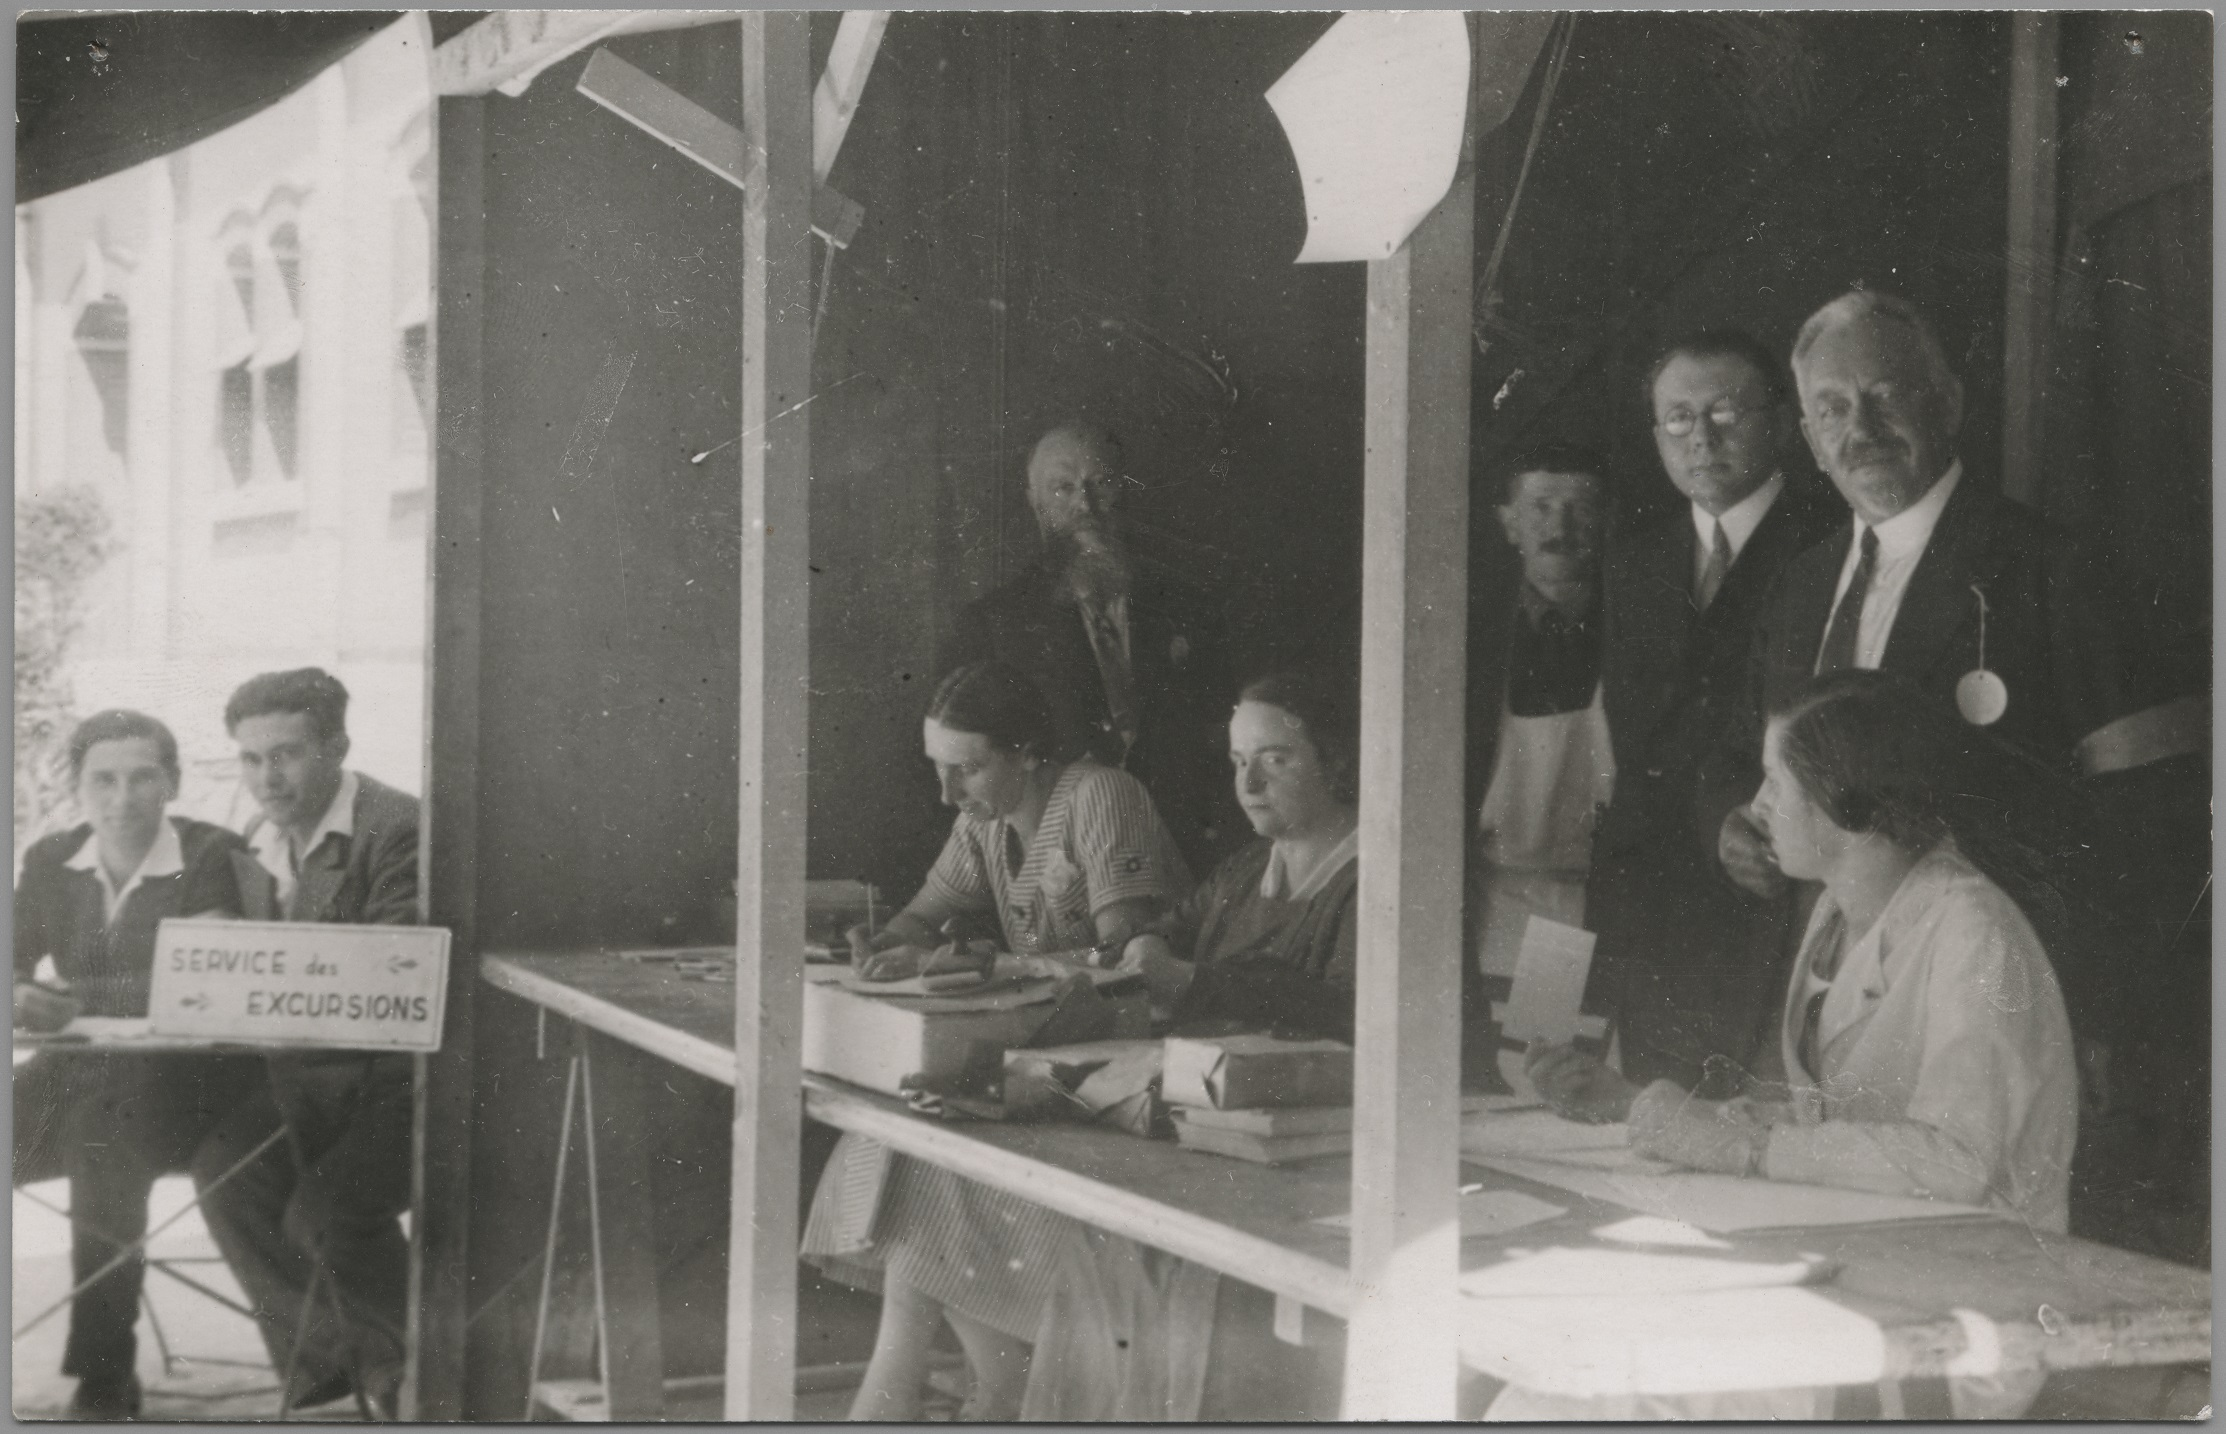 Reims - 1933